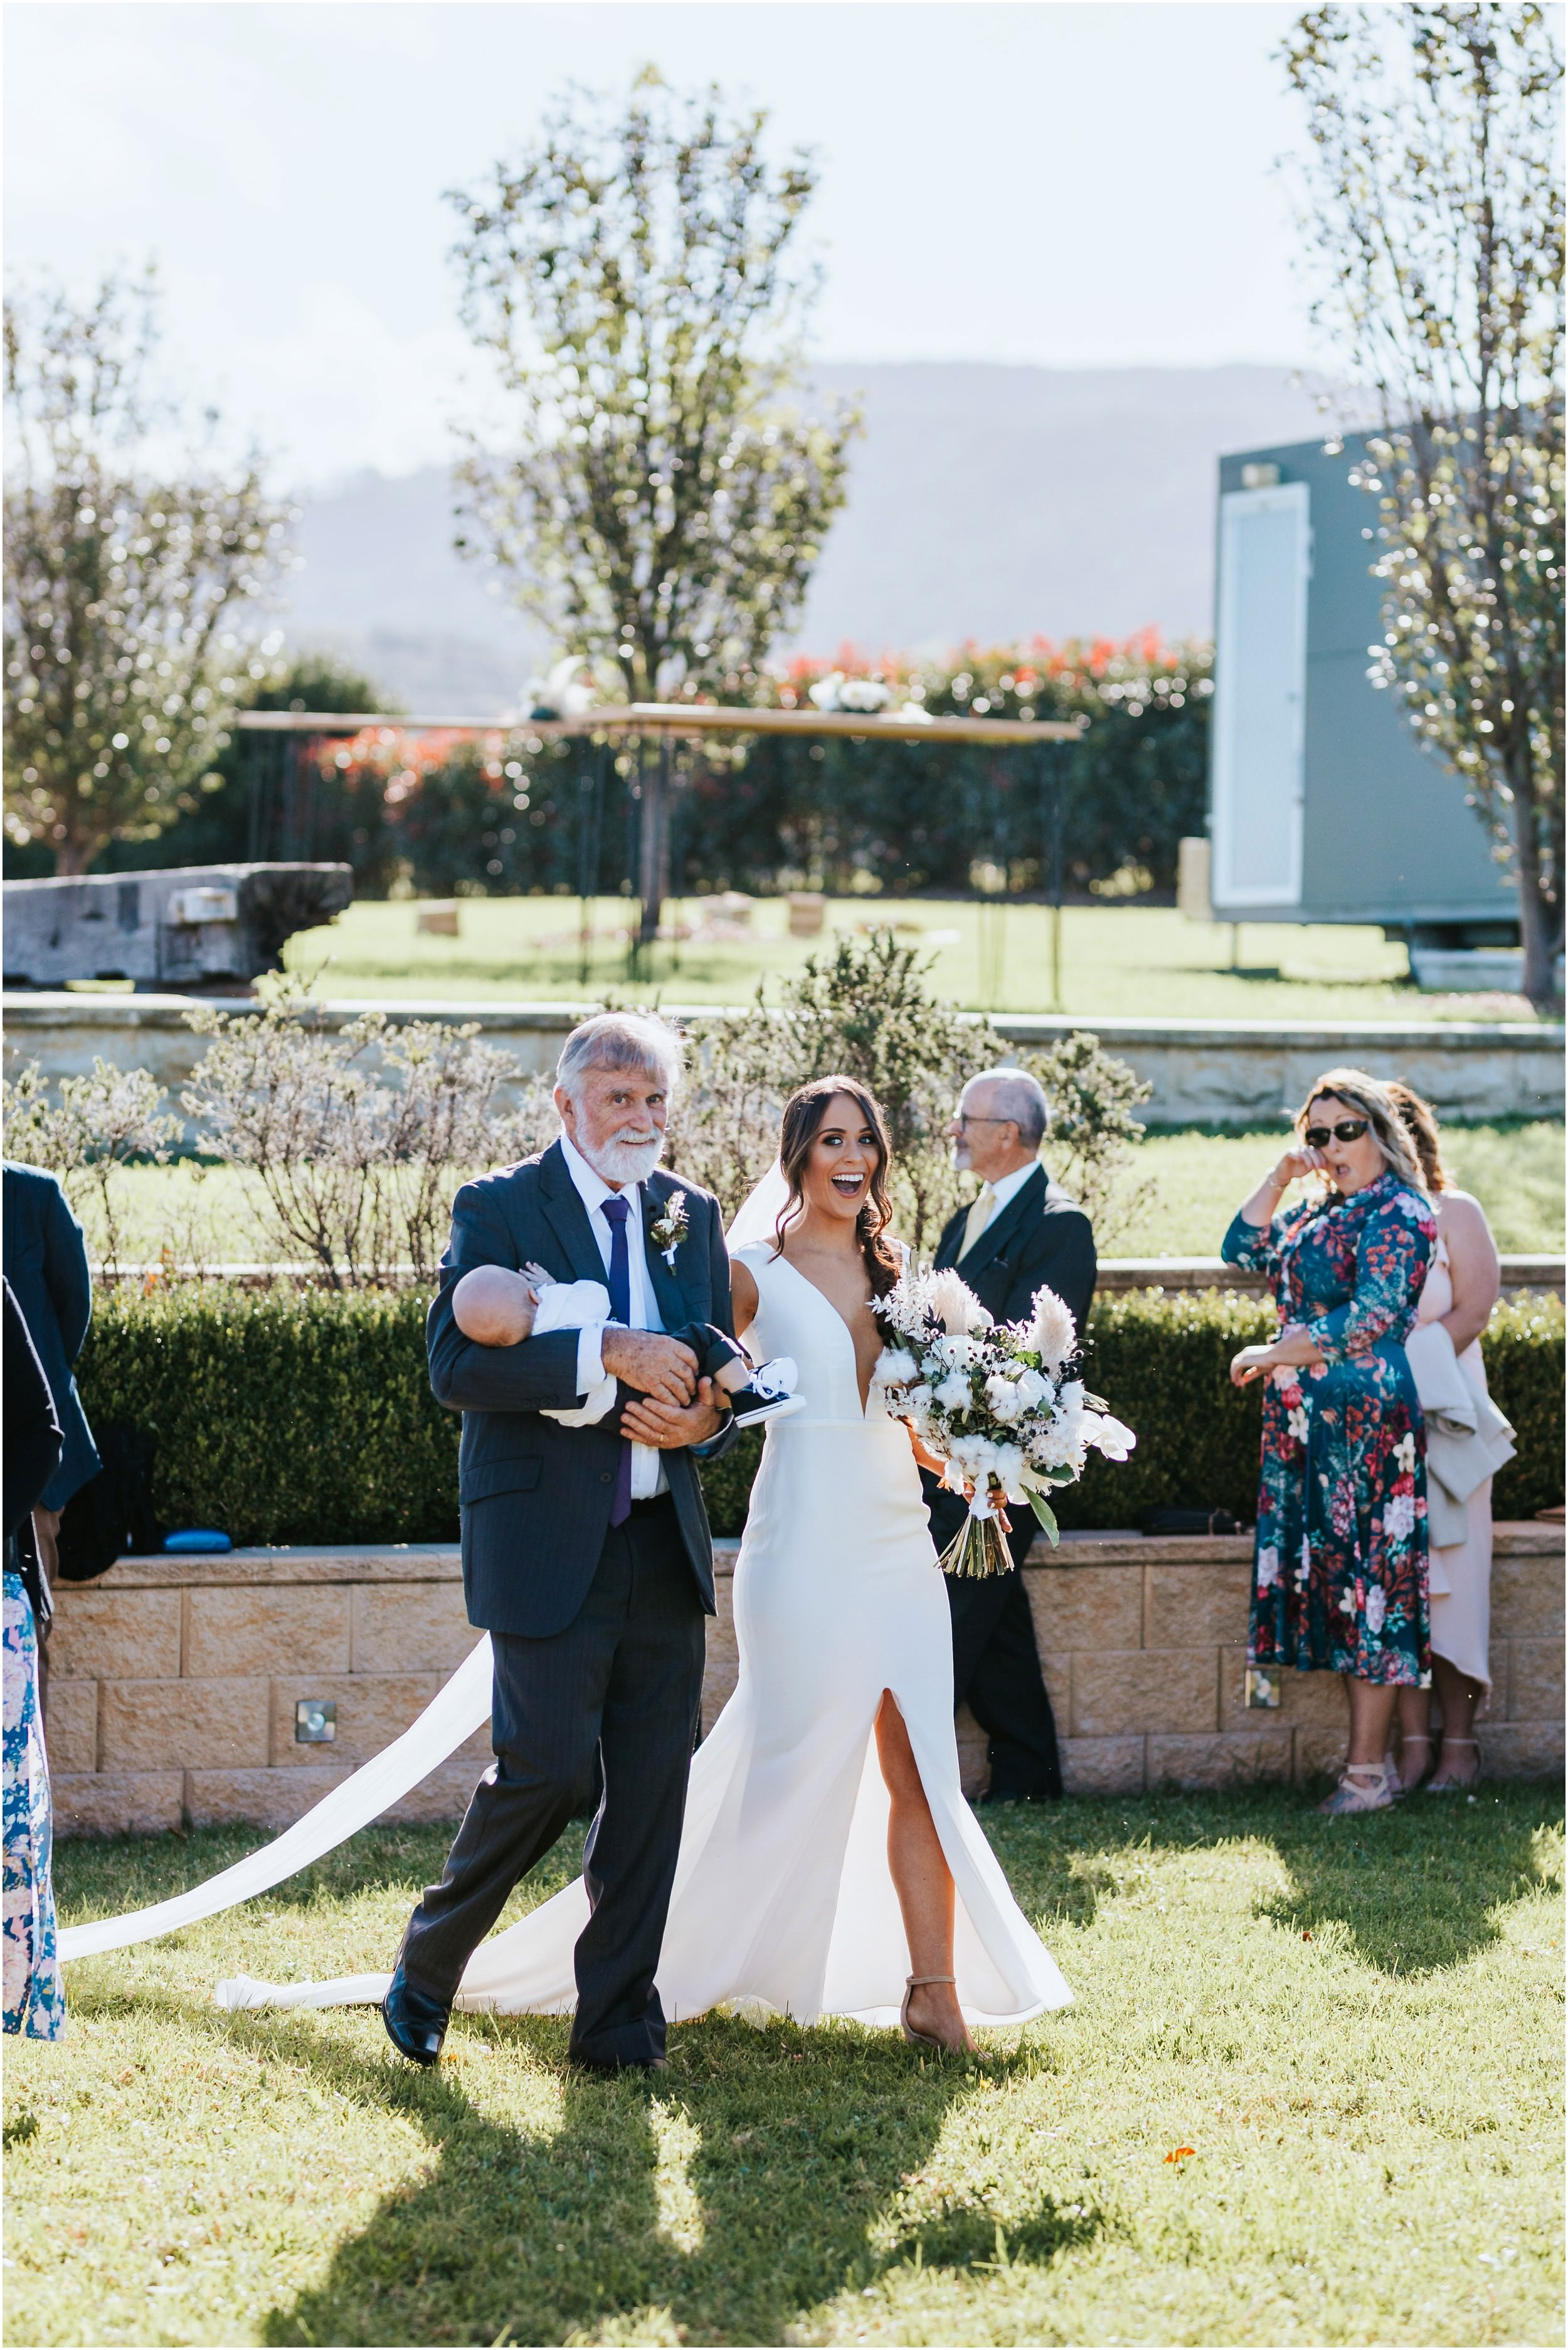 wedding_seacliff_house_alanah_keiran_0050.jpg